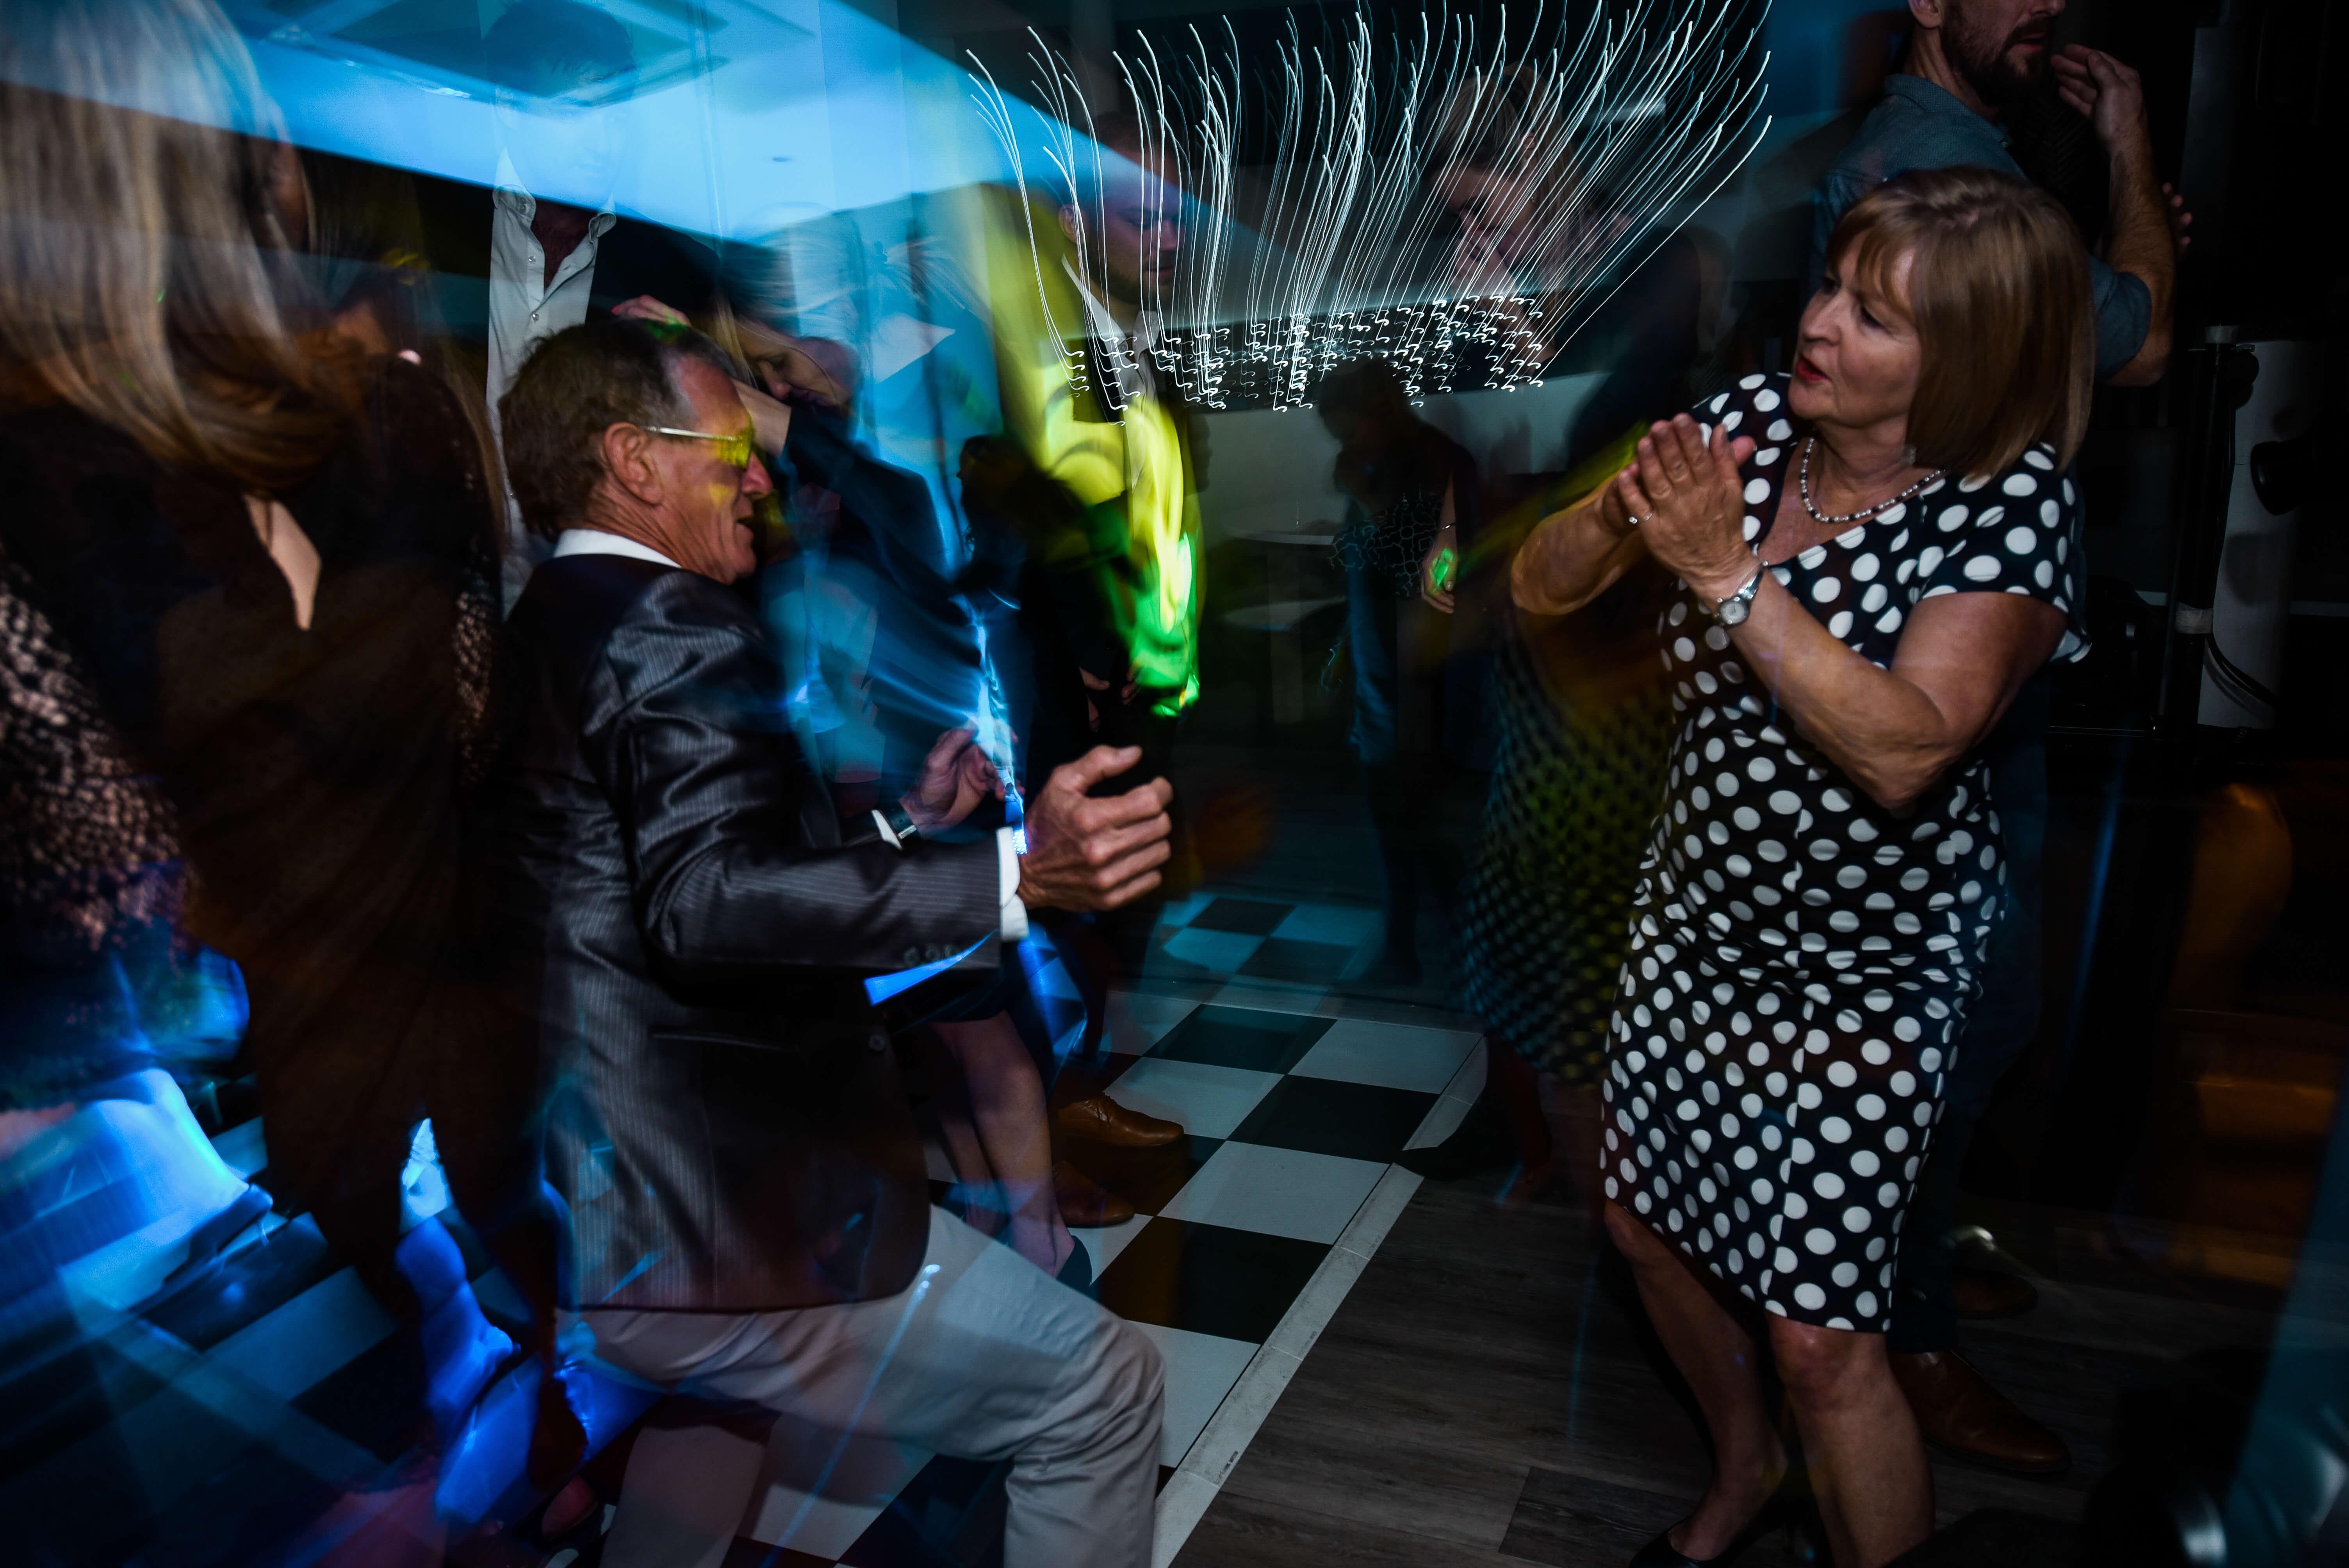 Couple breaking it down on the wedding dance floor with amazing lights.